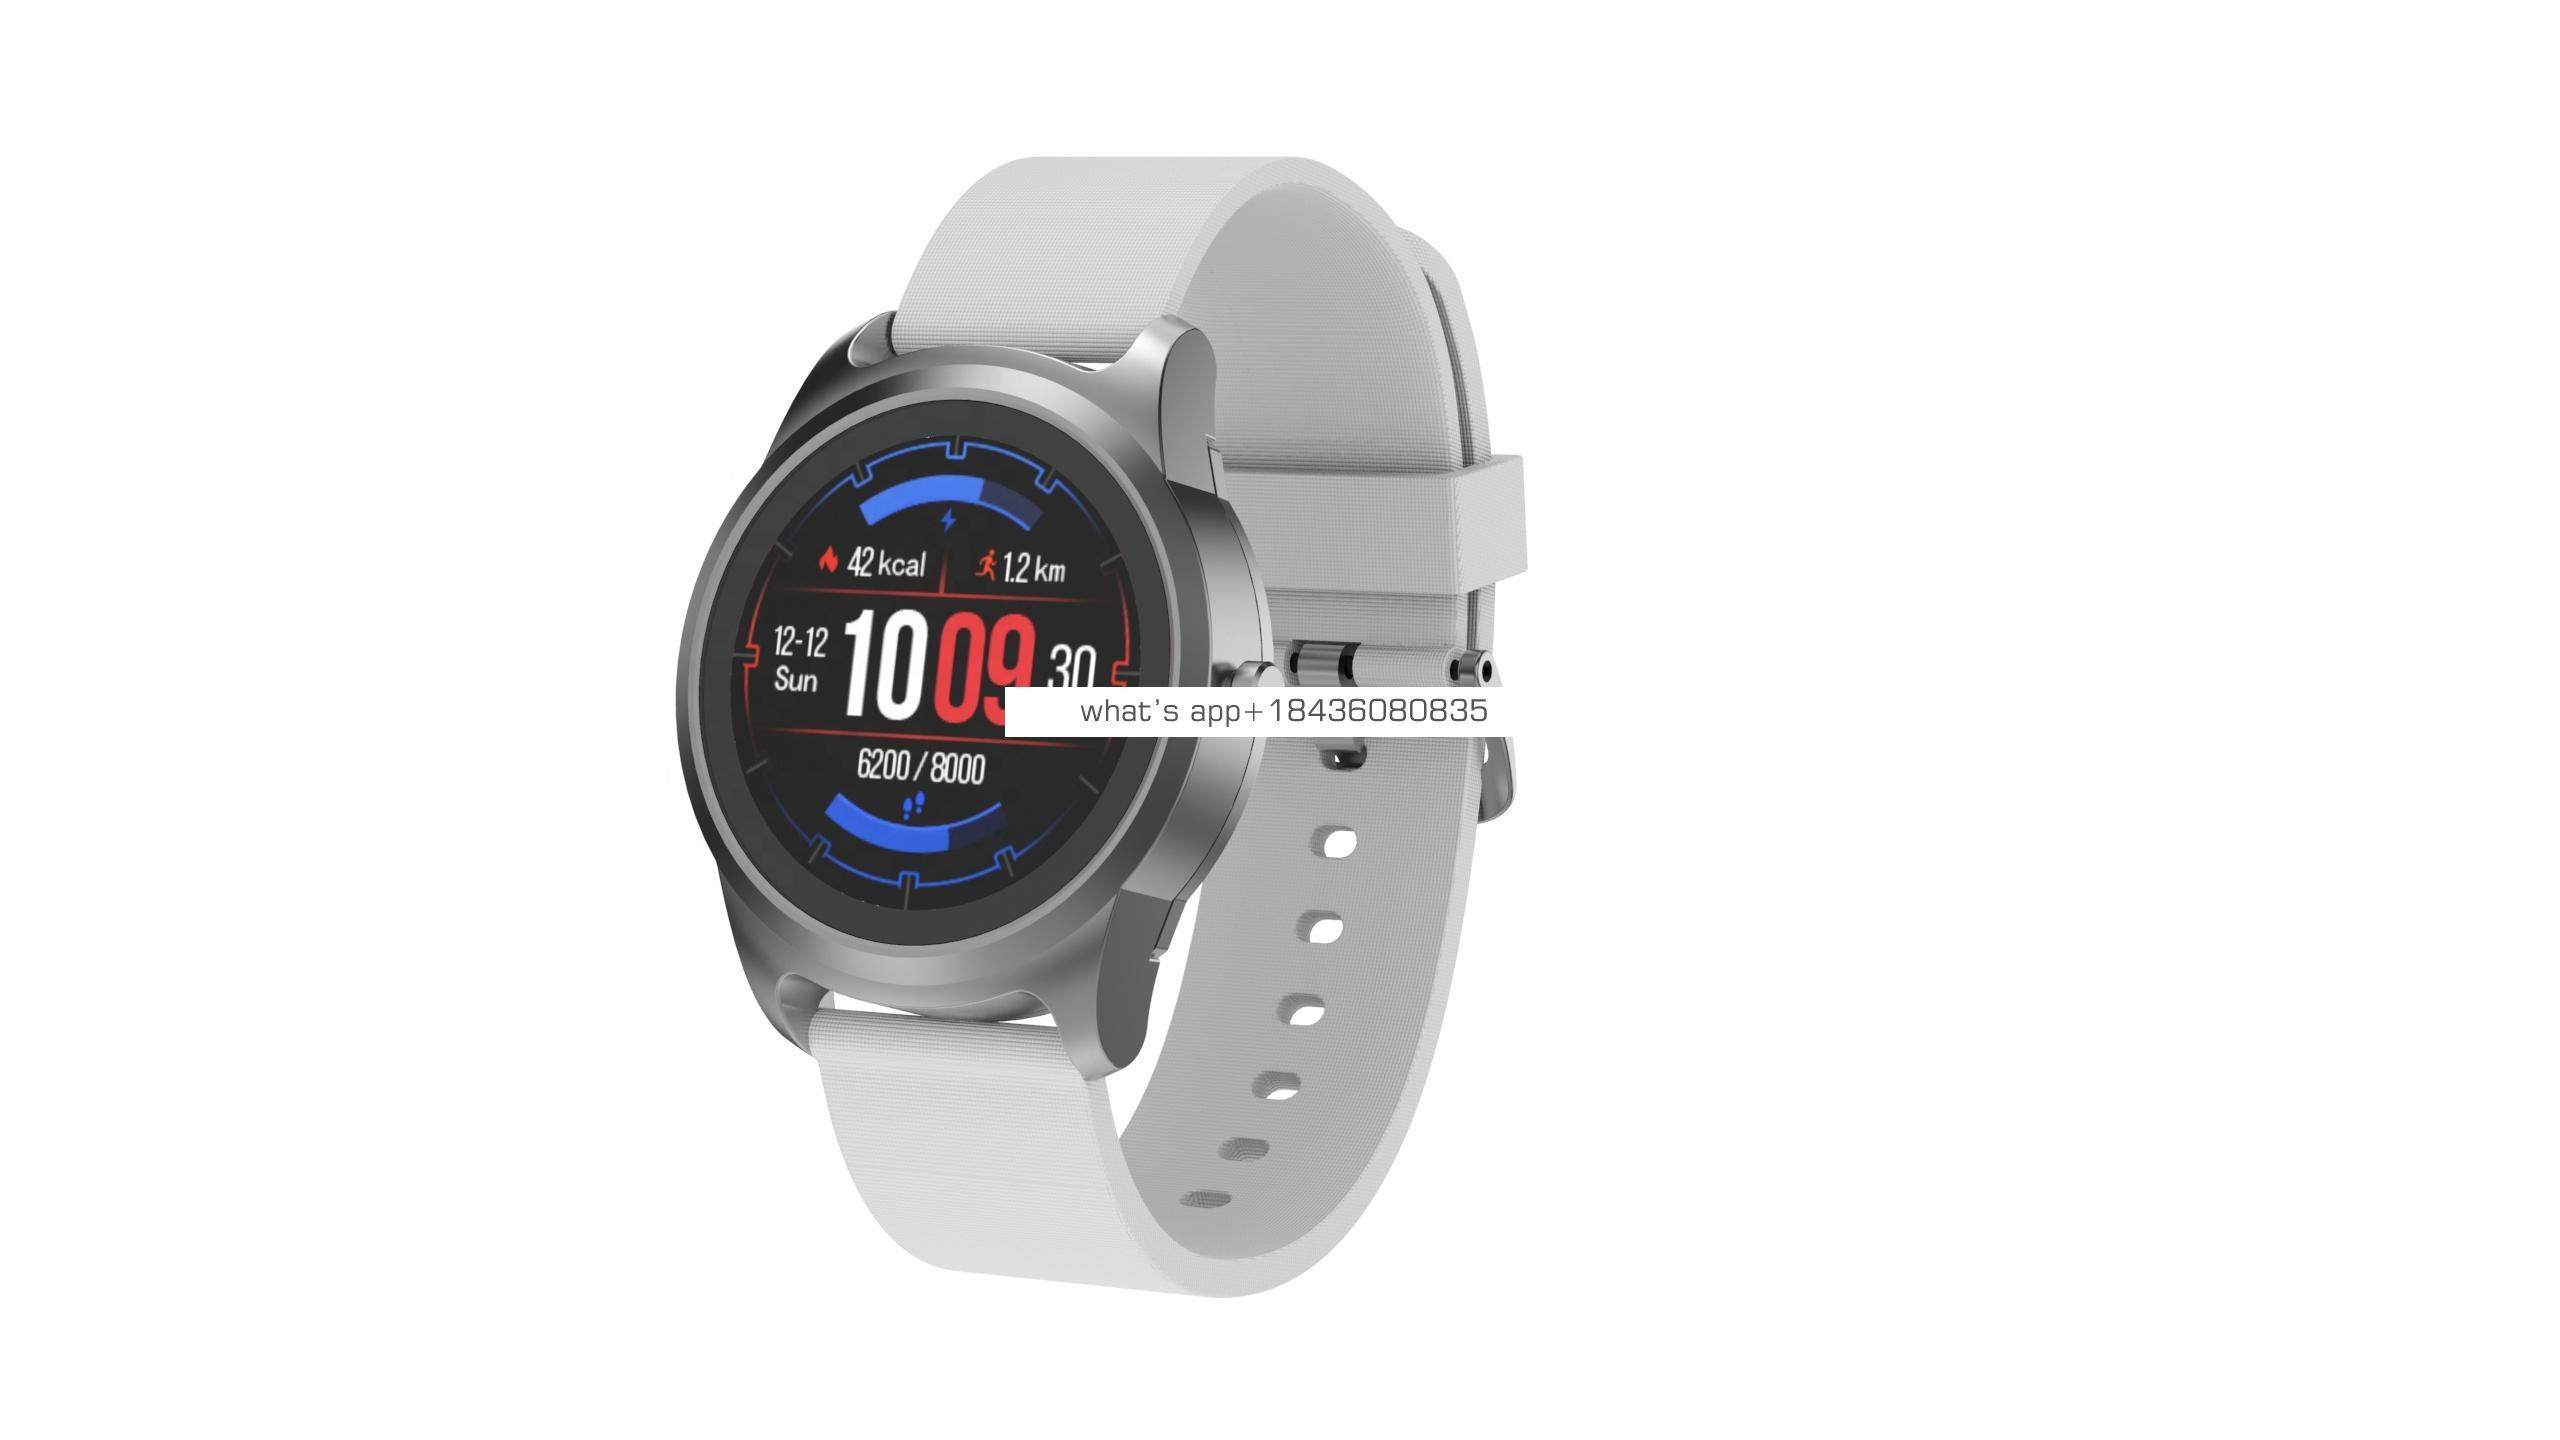 2019 new smart watch outdoor sport bracelet gps touch screen smartwatch